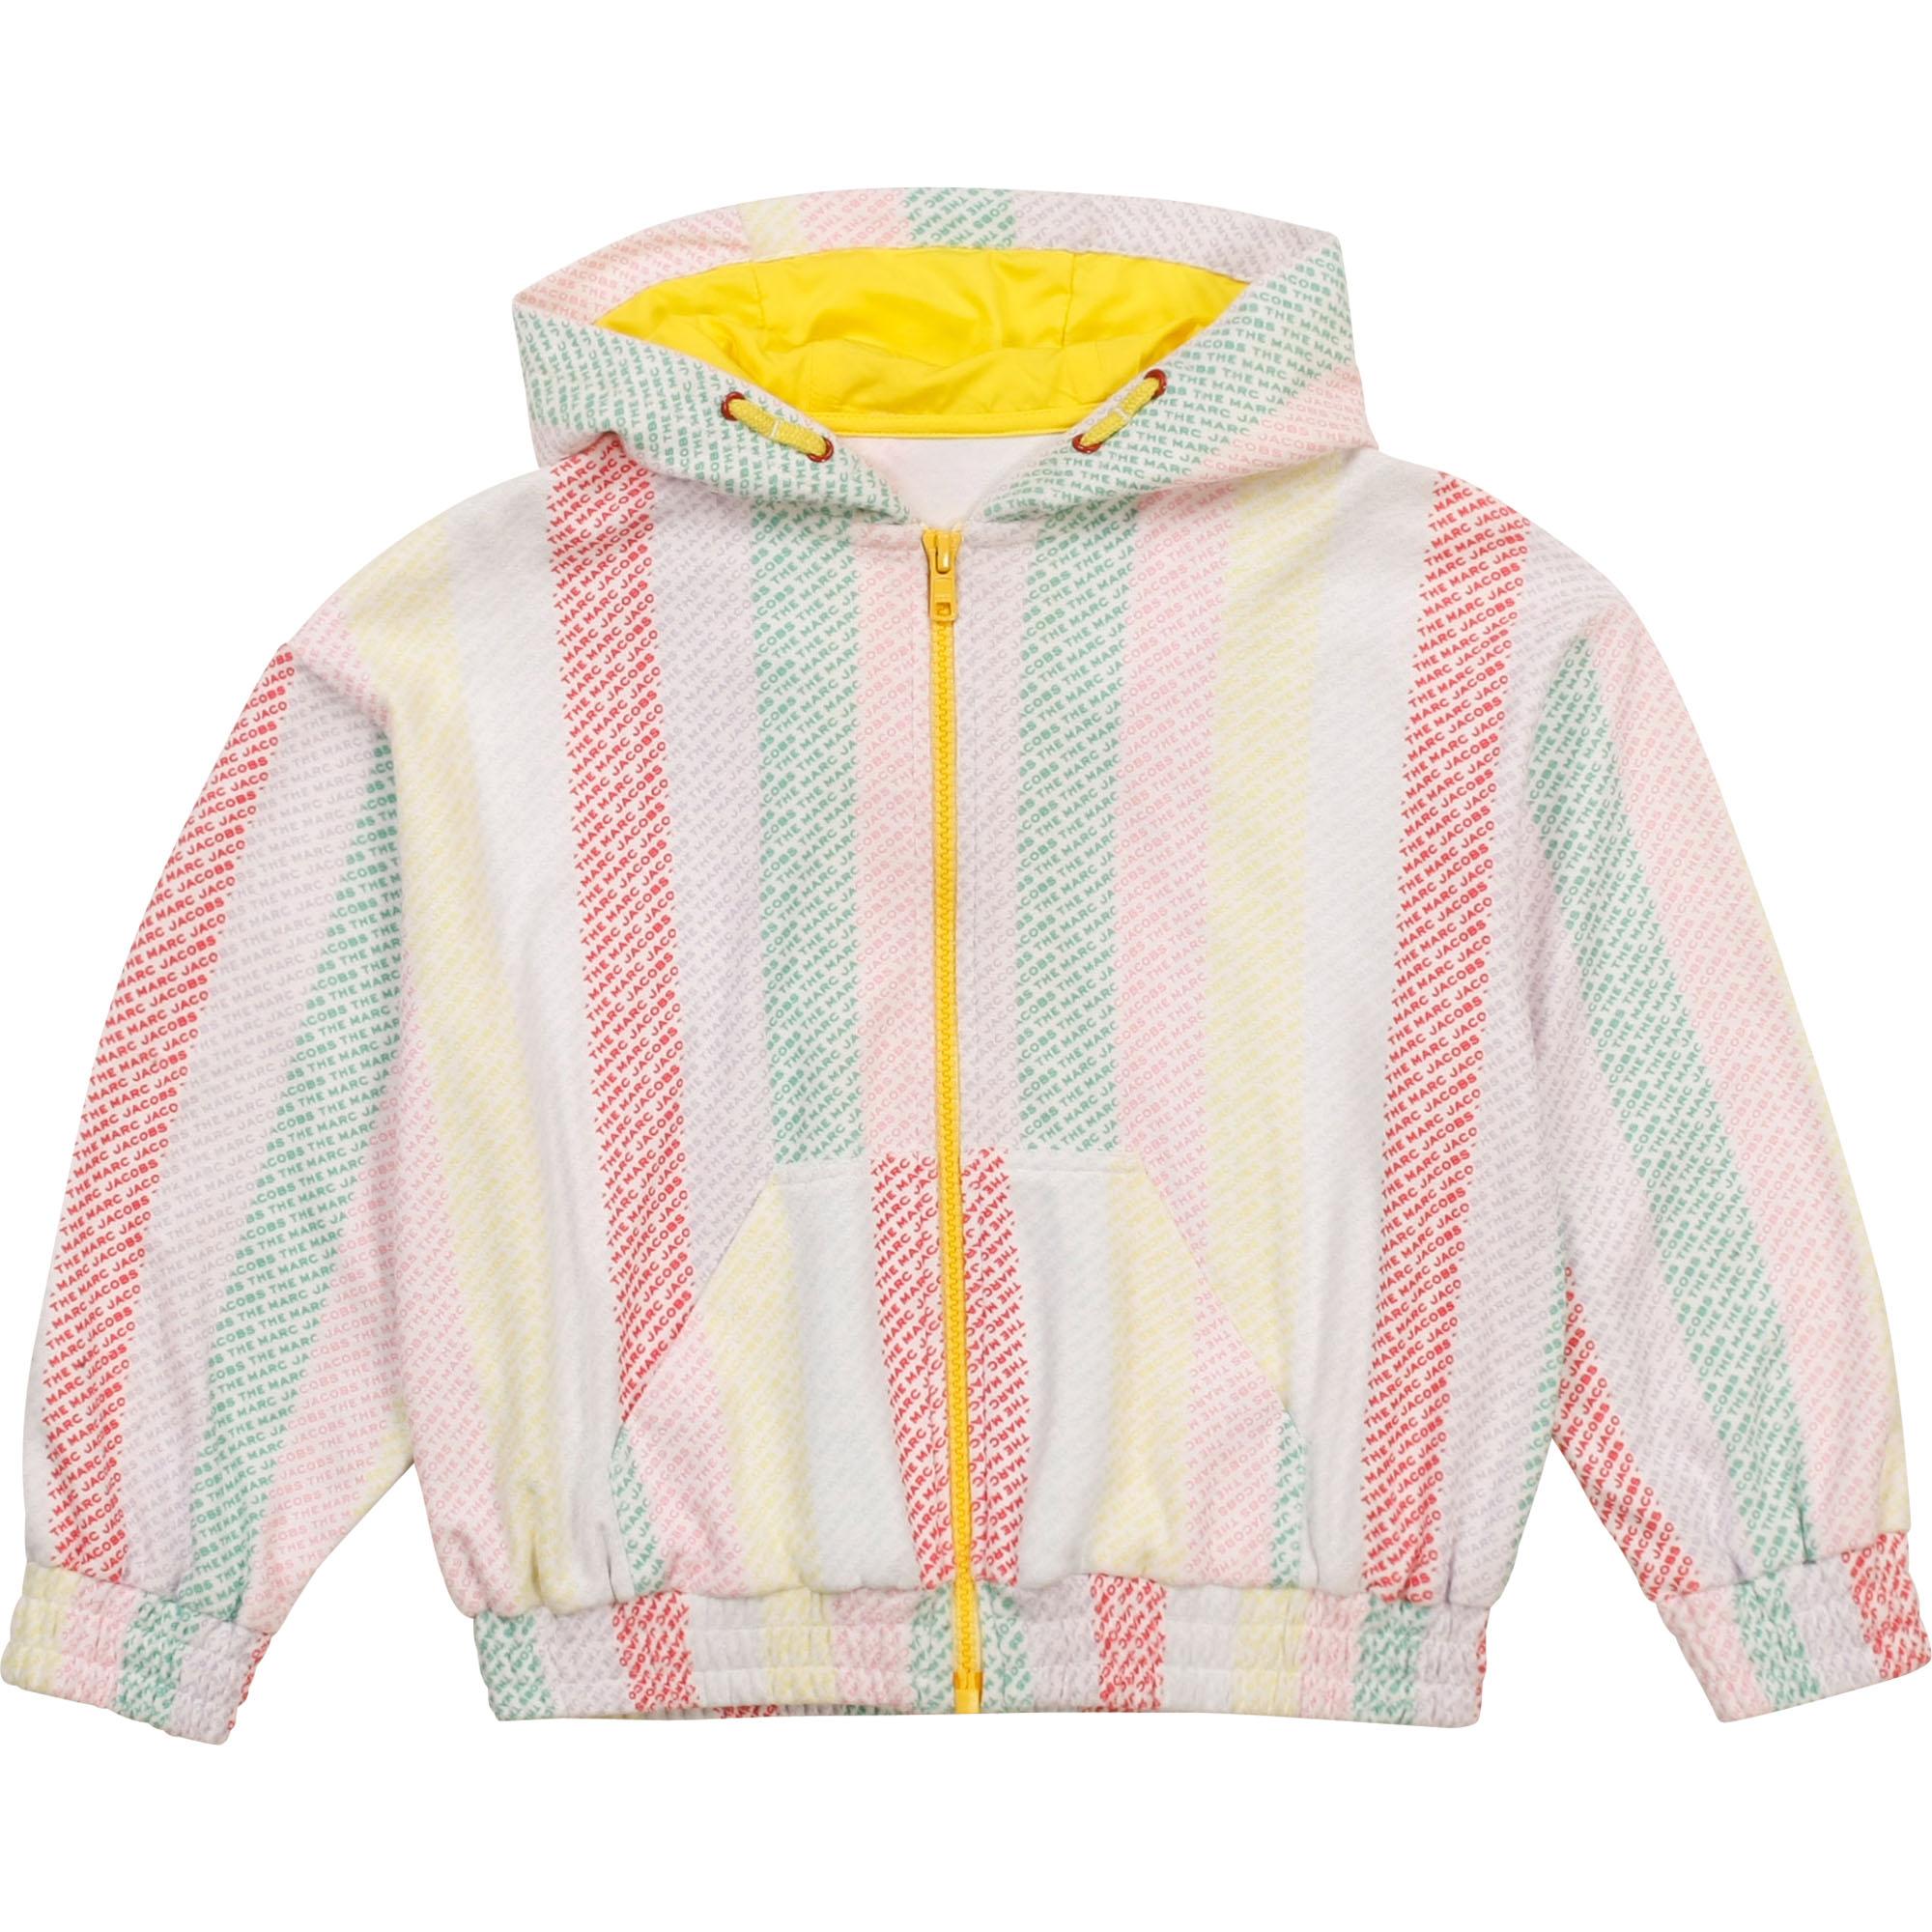 Hooded zip-up sweatshirt THE MARC JACOBS for GIRL